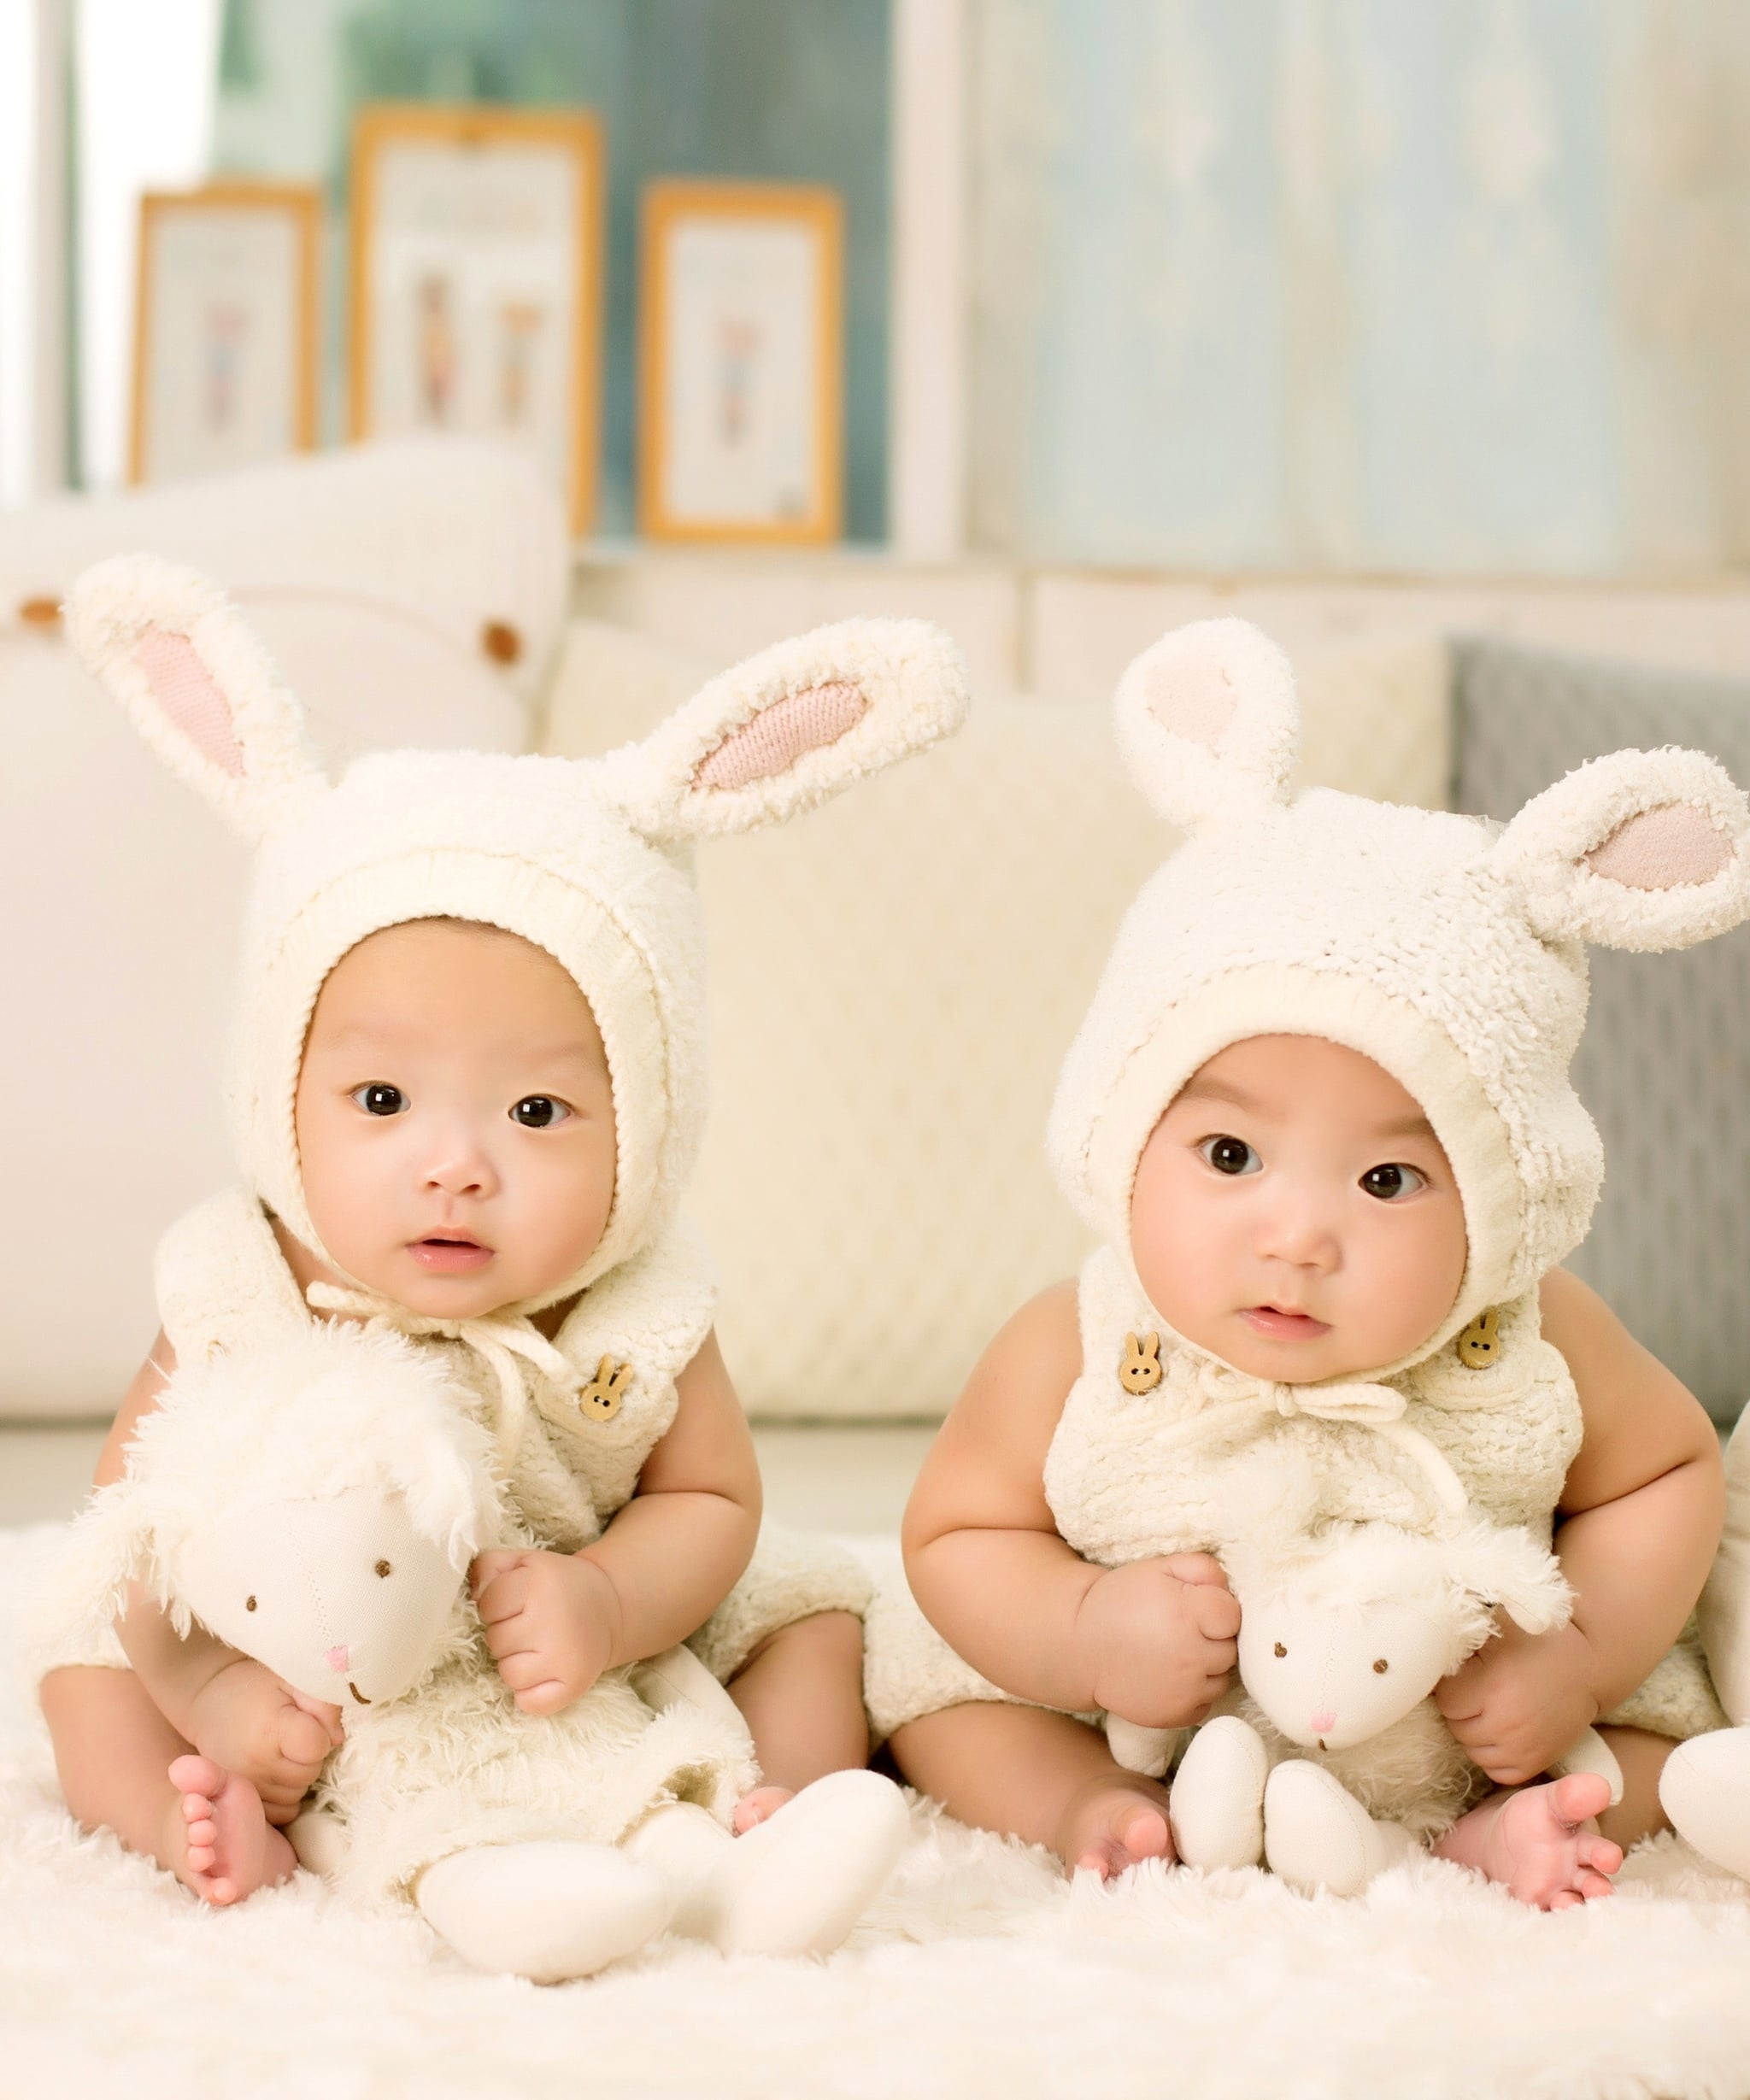 tmp_ndYBOM_32b64e10275c8956_babies-cute-kids-36039.jpg